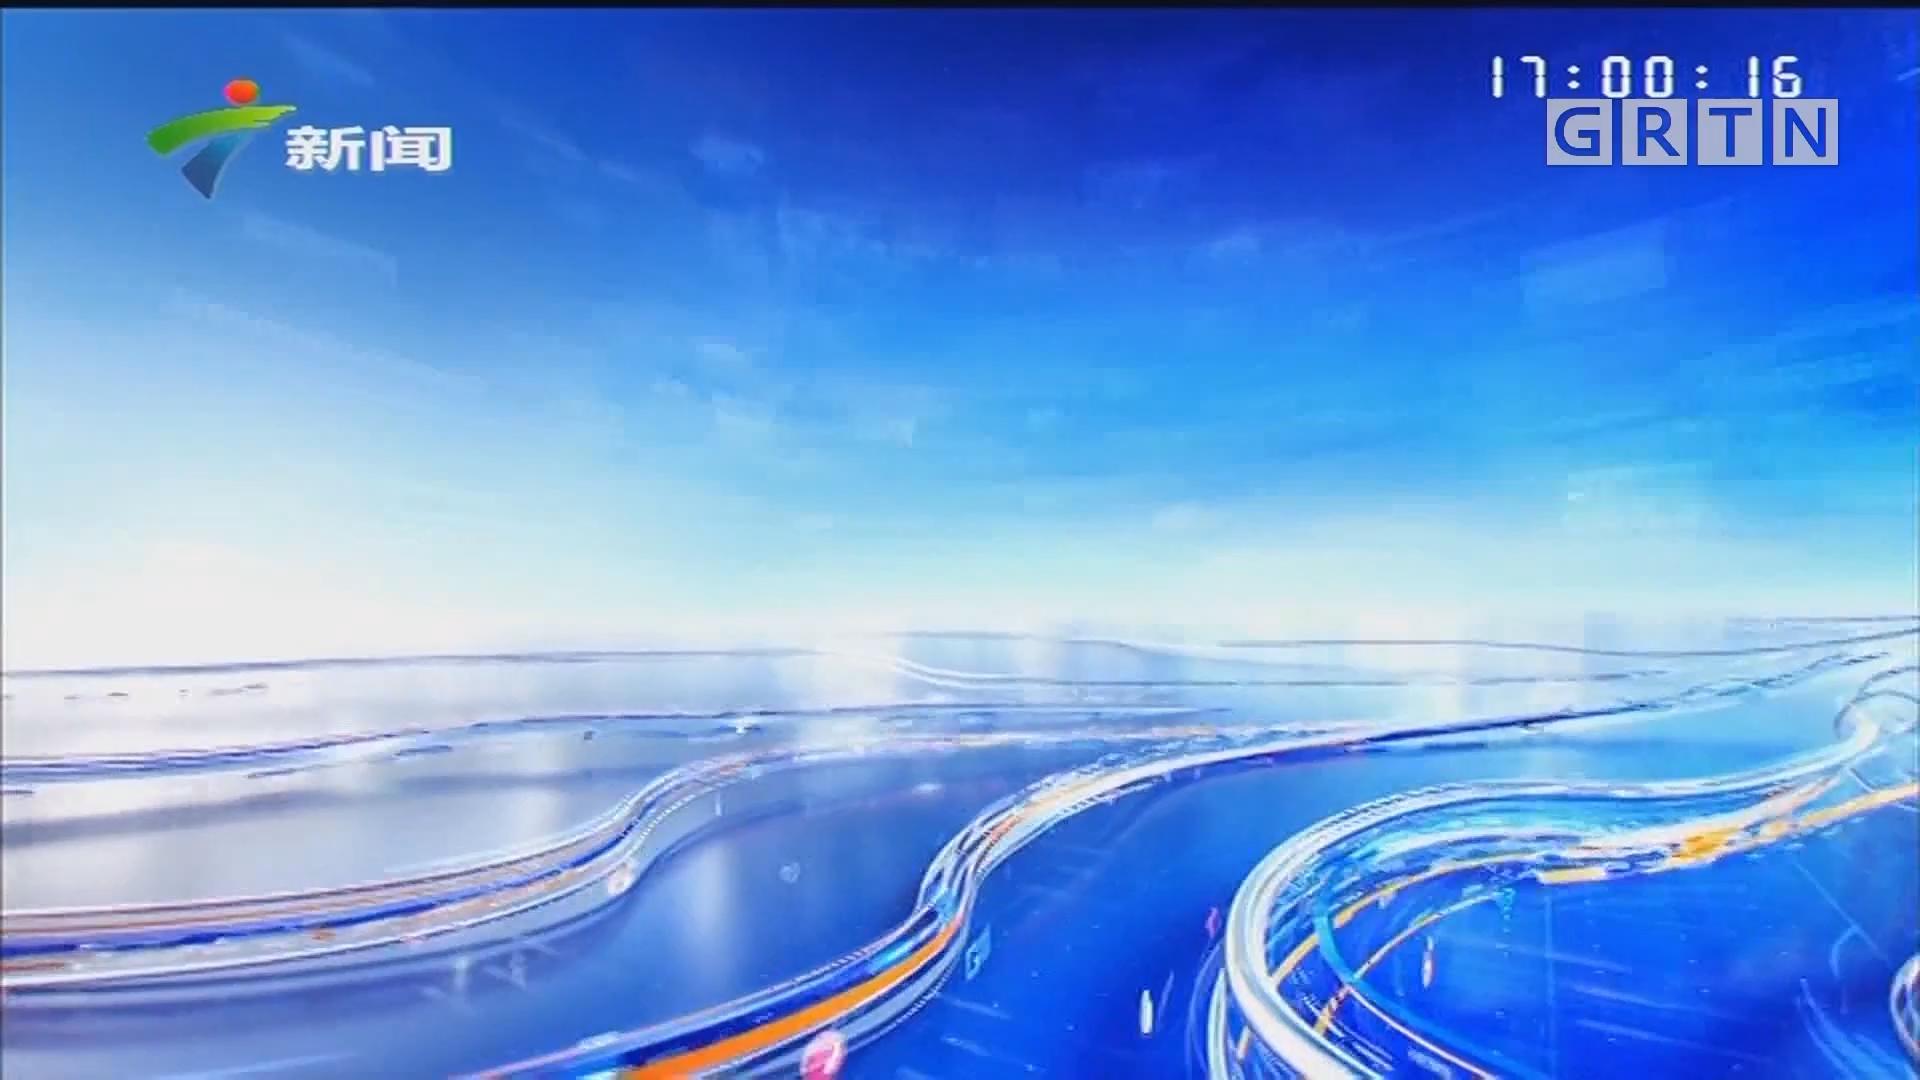 [HD][2019-06-12]直播广东:全省联合开展海洋日宣传活动 号召珍爱海洋